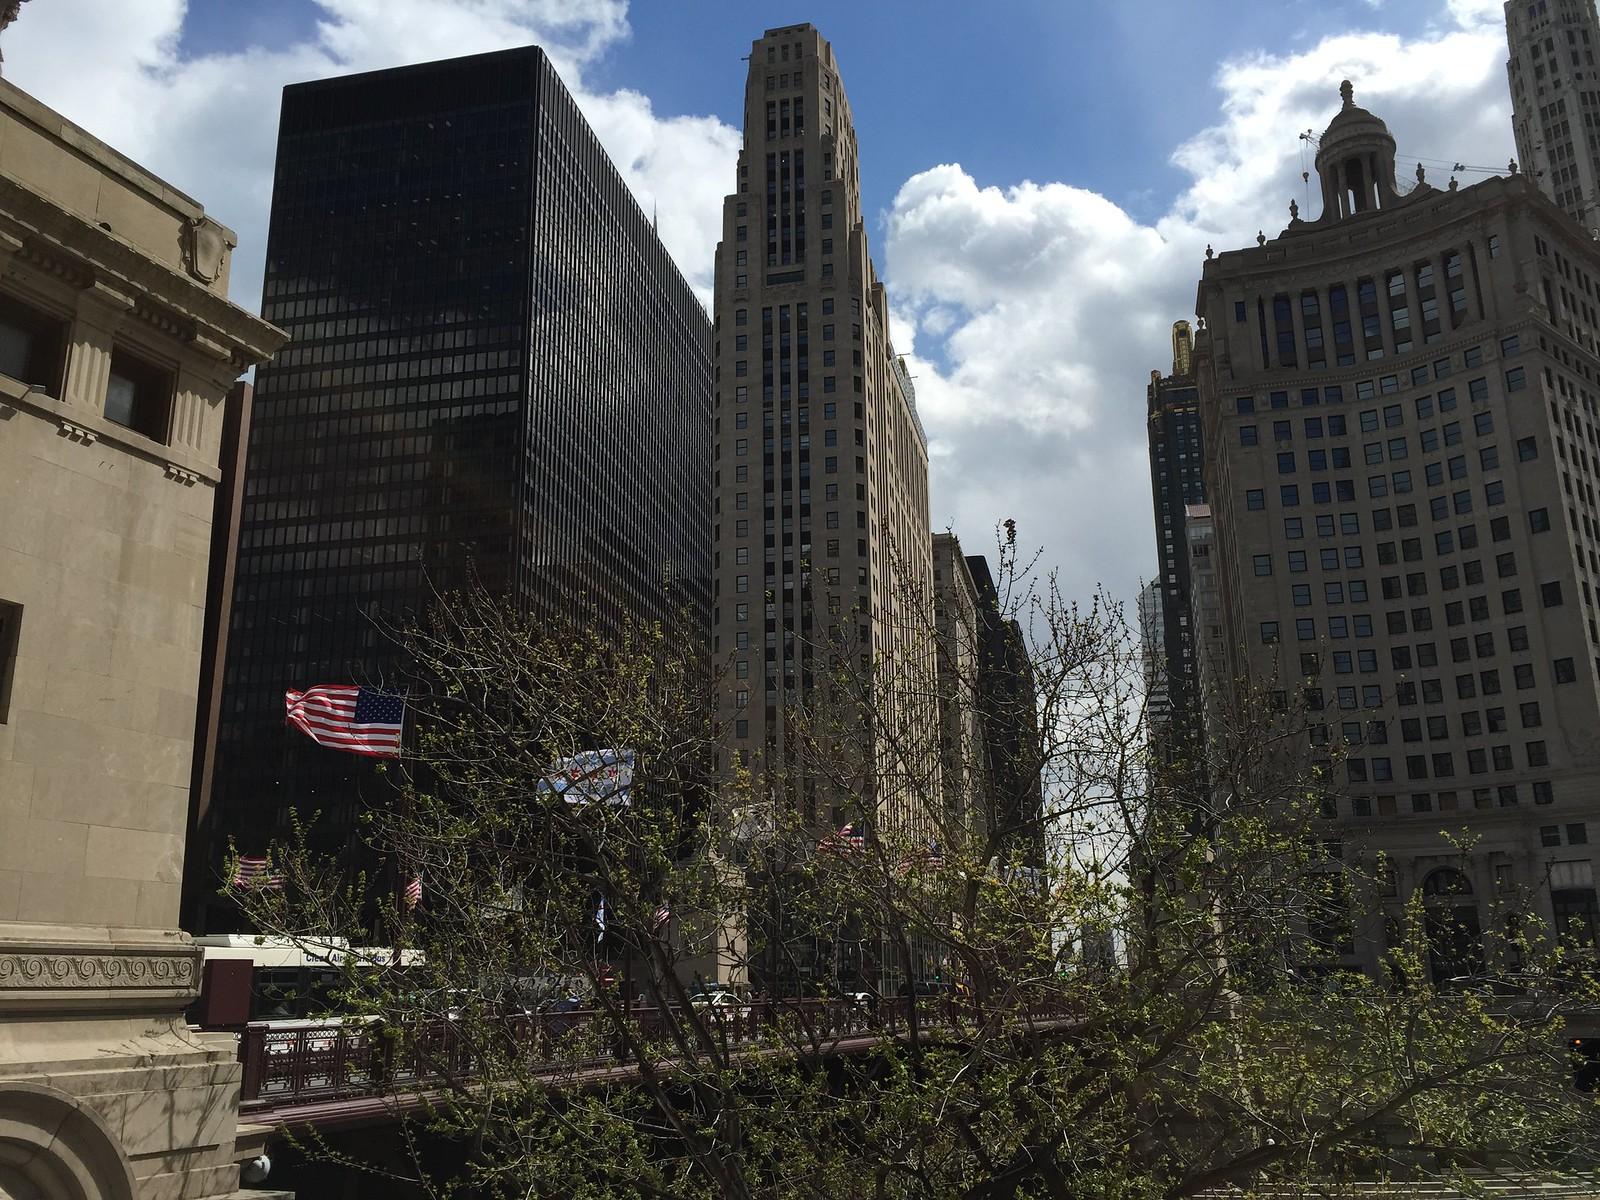 Chicago 21-04-2015 14-30-59